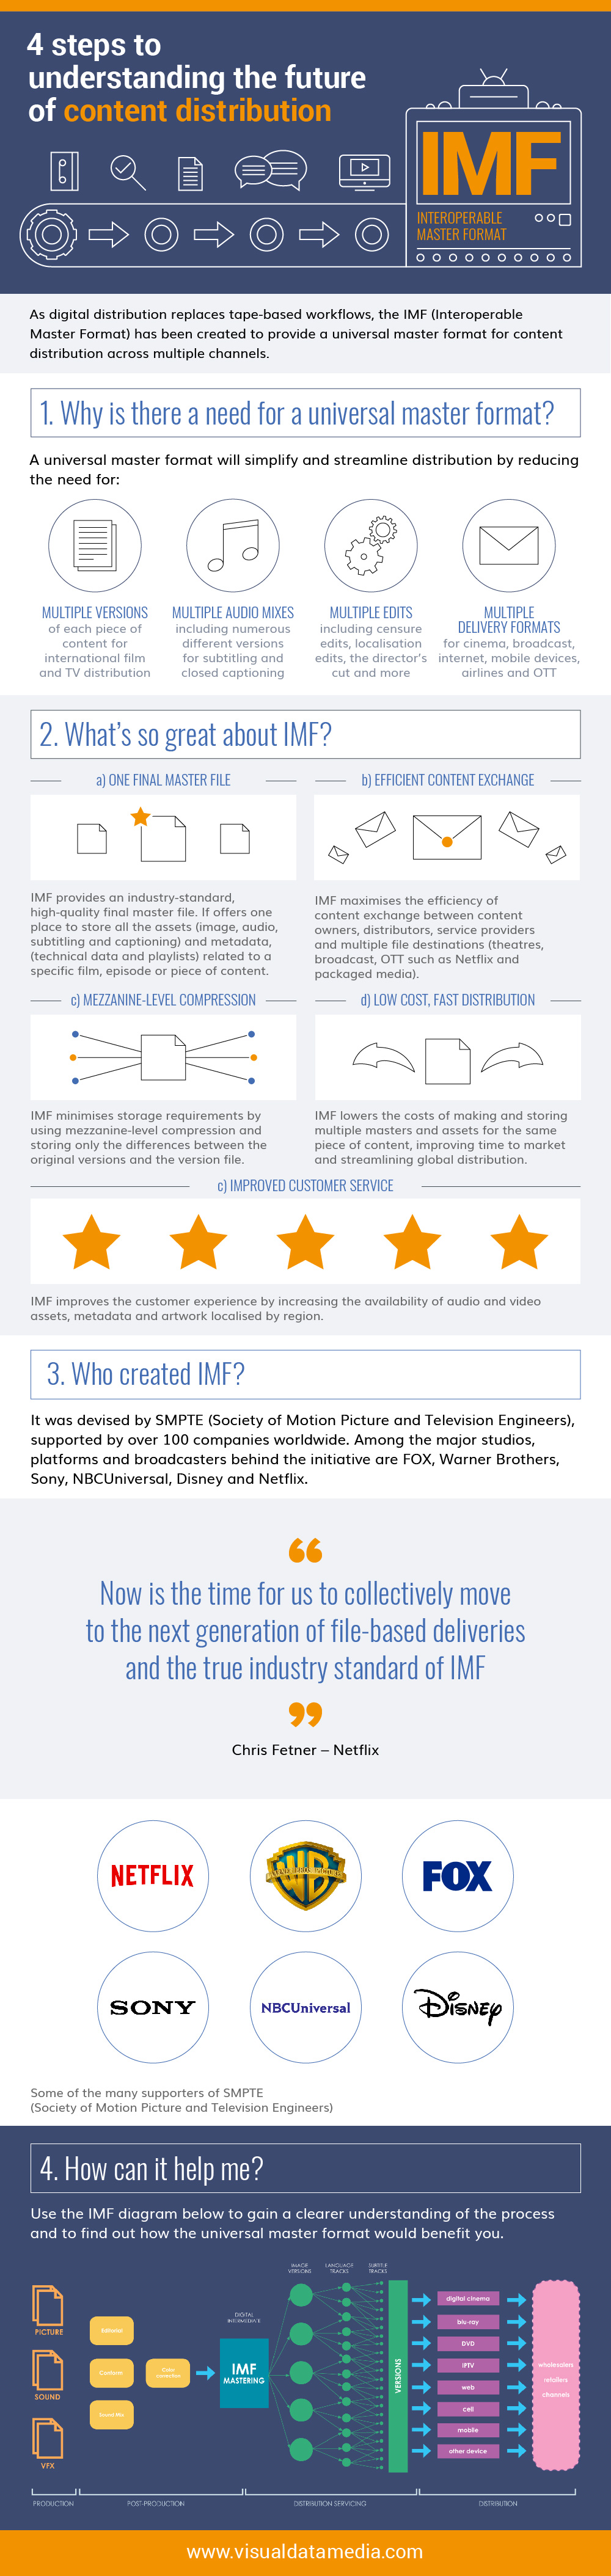 IMF-infographic-5.0-01